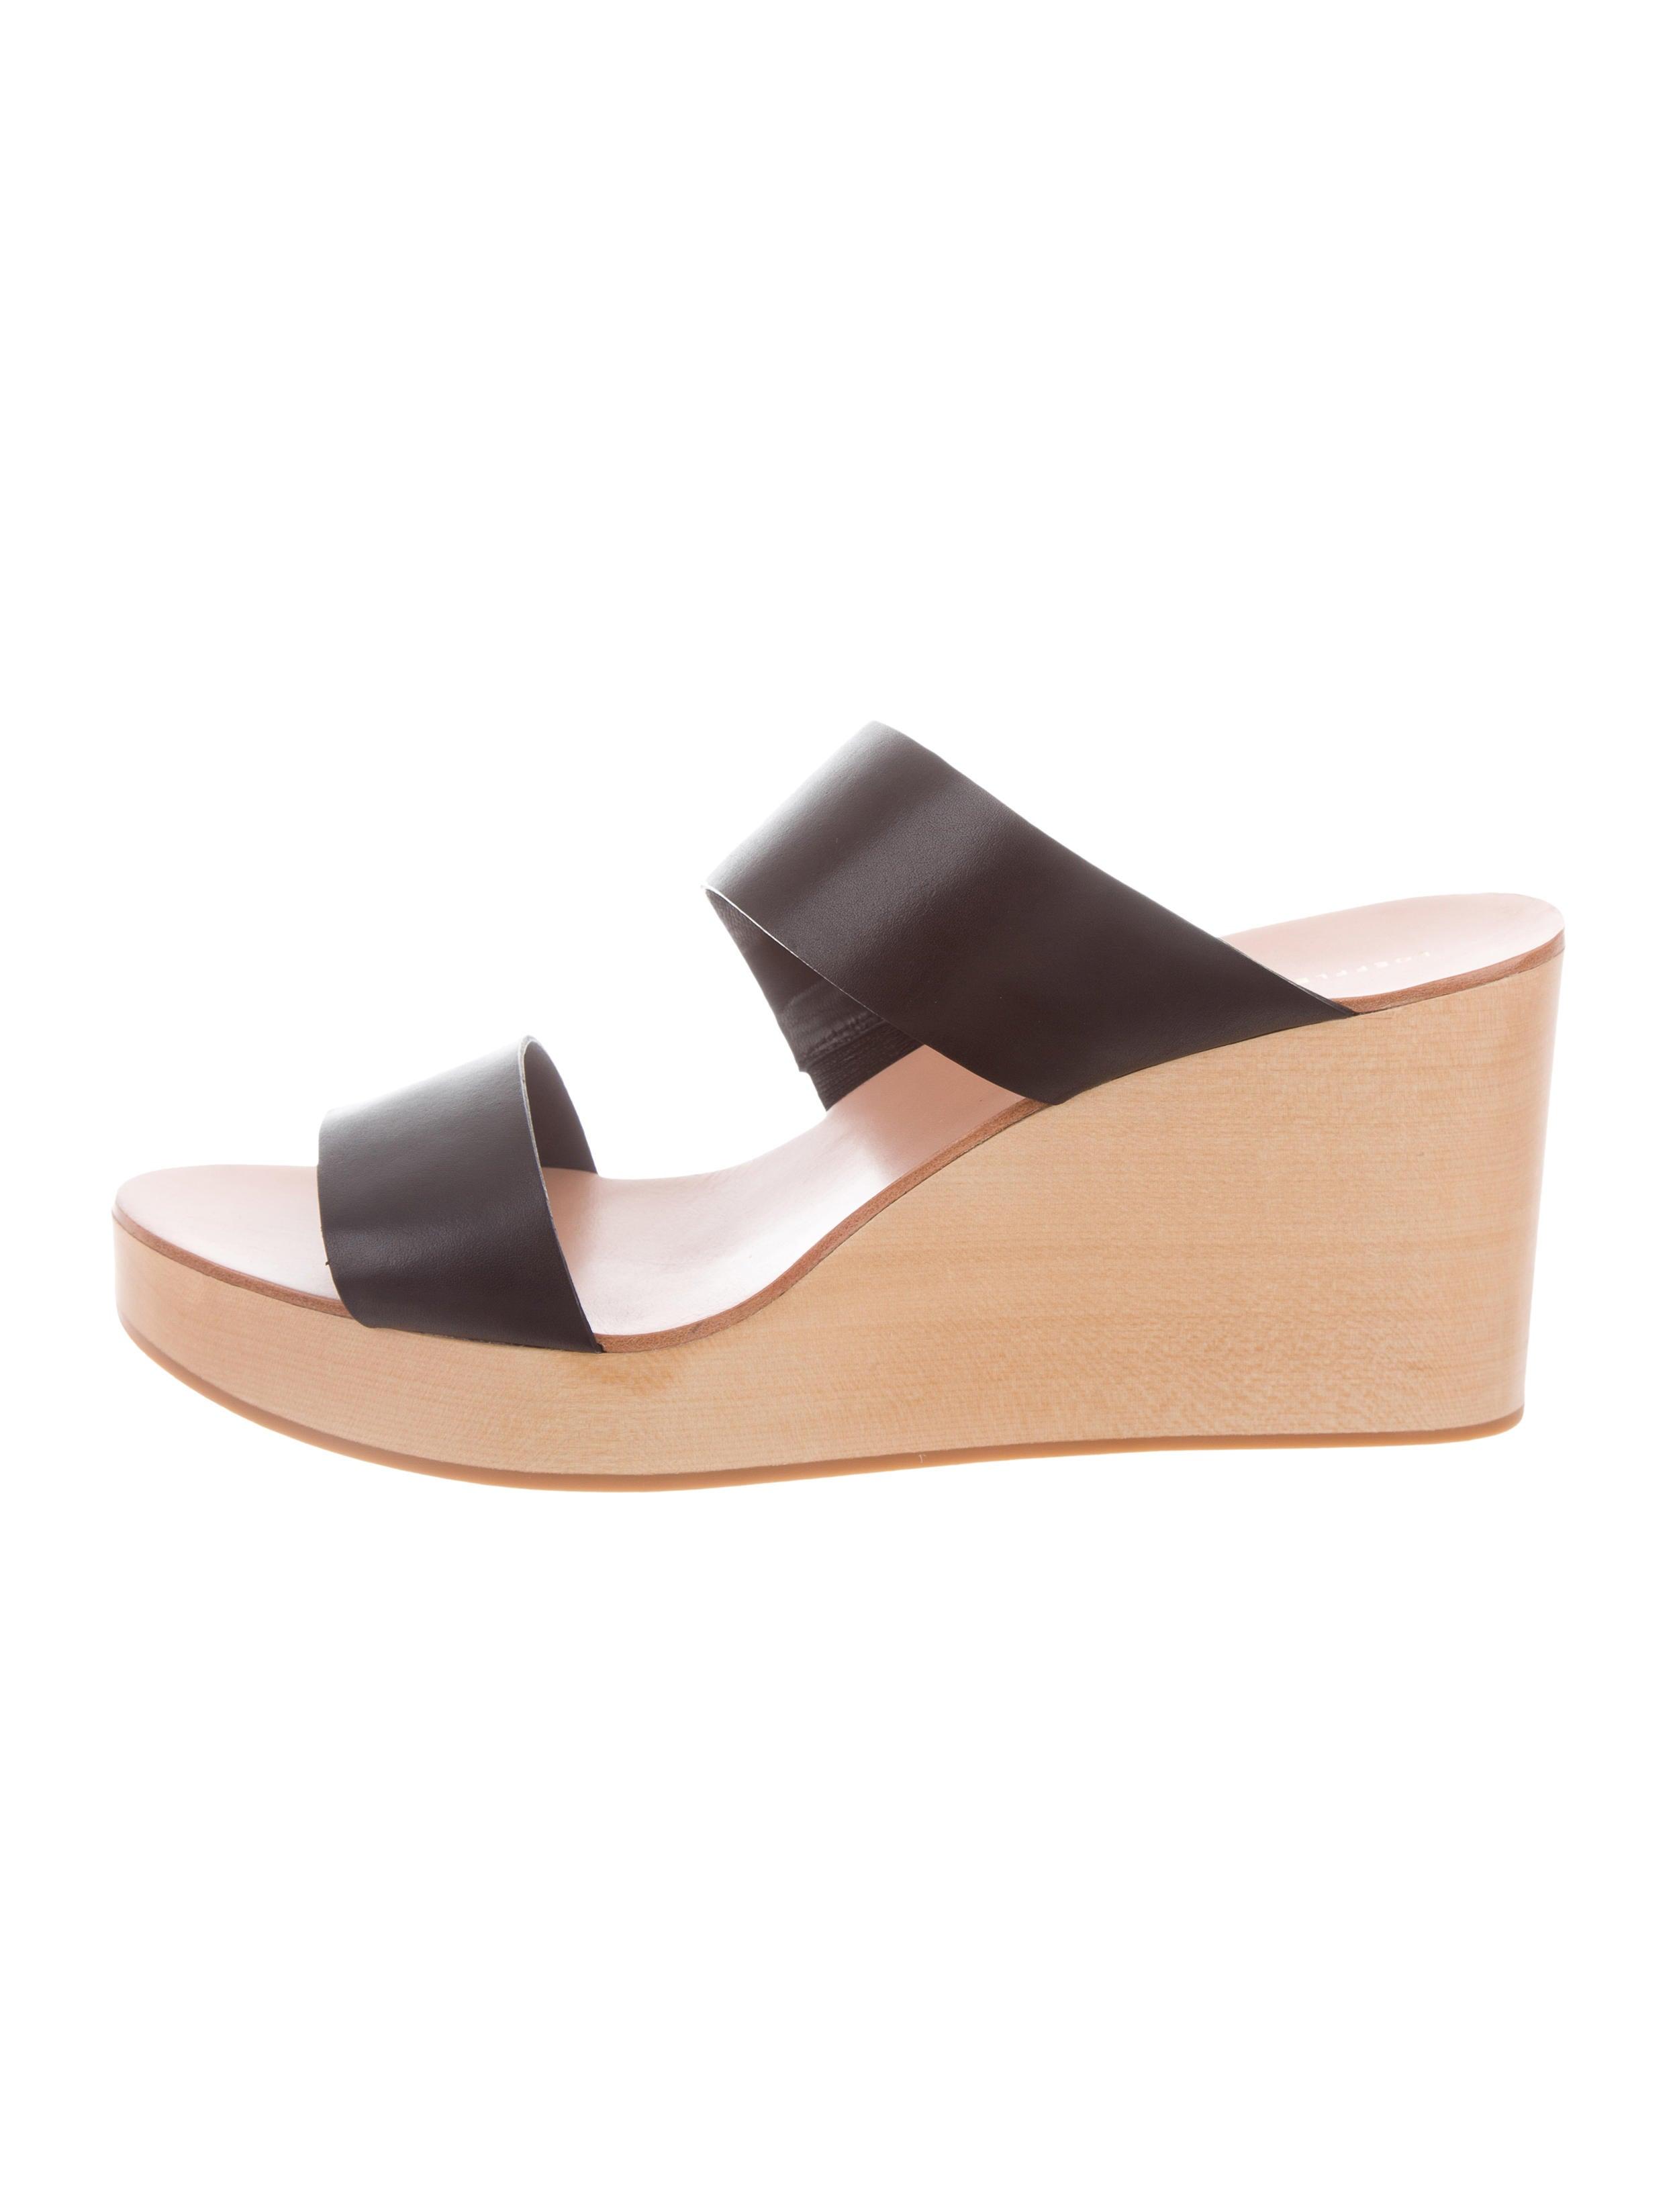 Loeffler Randall Mason Slide Sandals w/ Tags fashionable cheap price DClYZ9ar